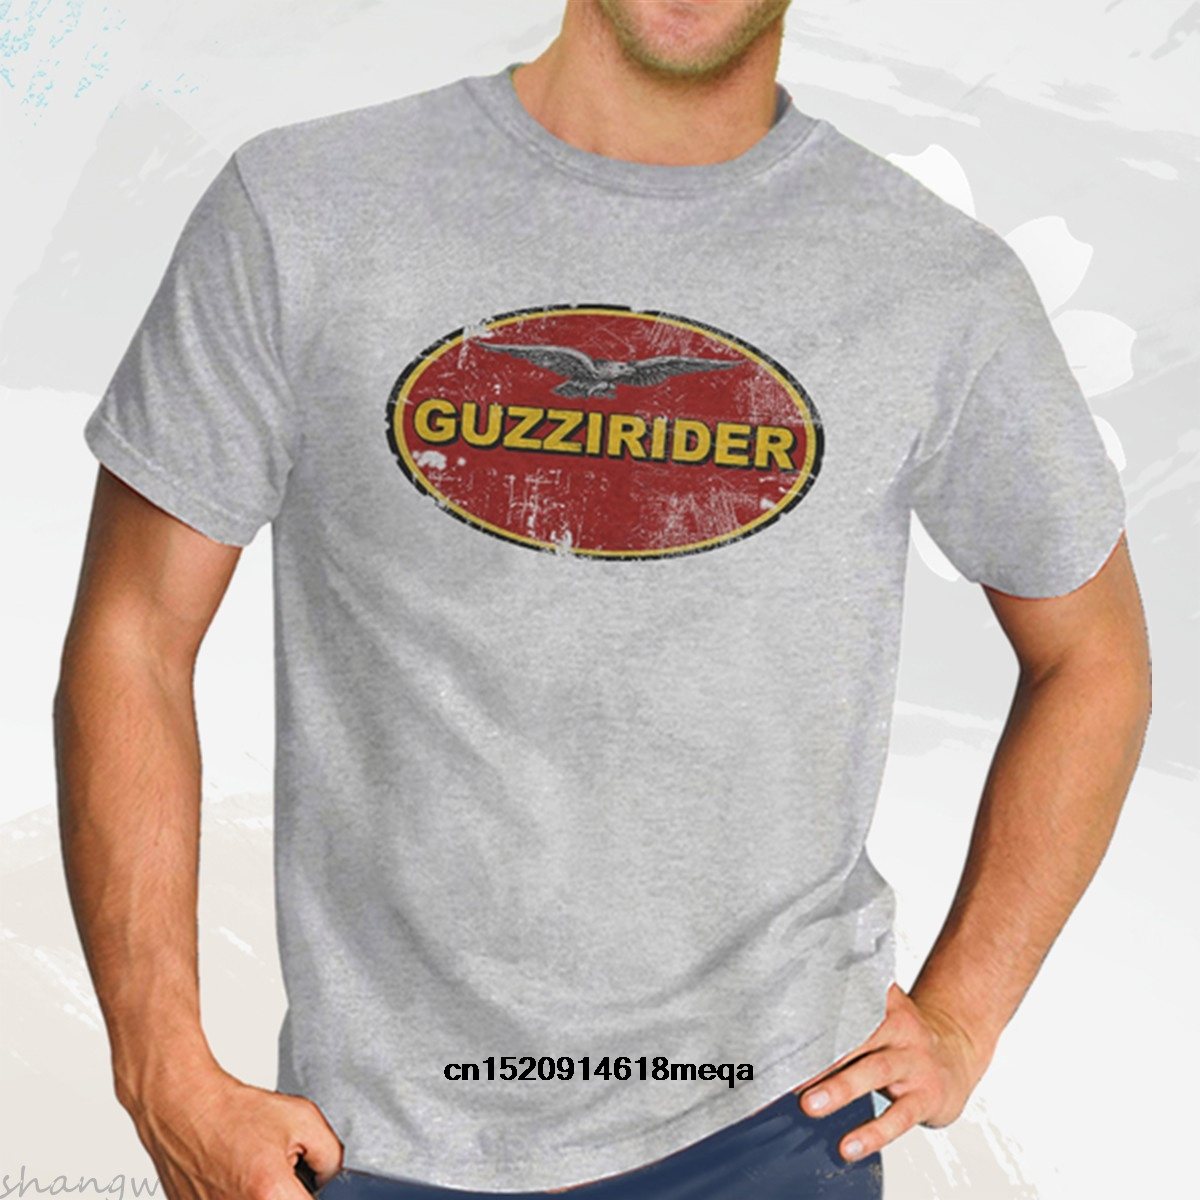 Guzzi Rider Italian Moto Guzzi Tee Shirt Men's Round Neck Short Sleeves Cotton T-shirt in Grey Motorbike Cafe Racer